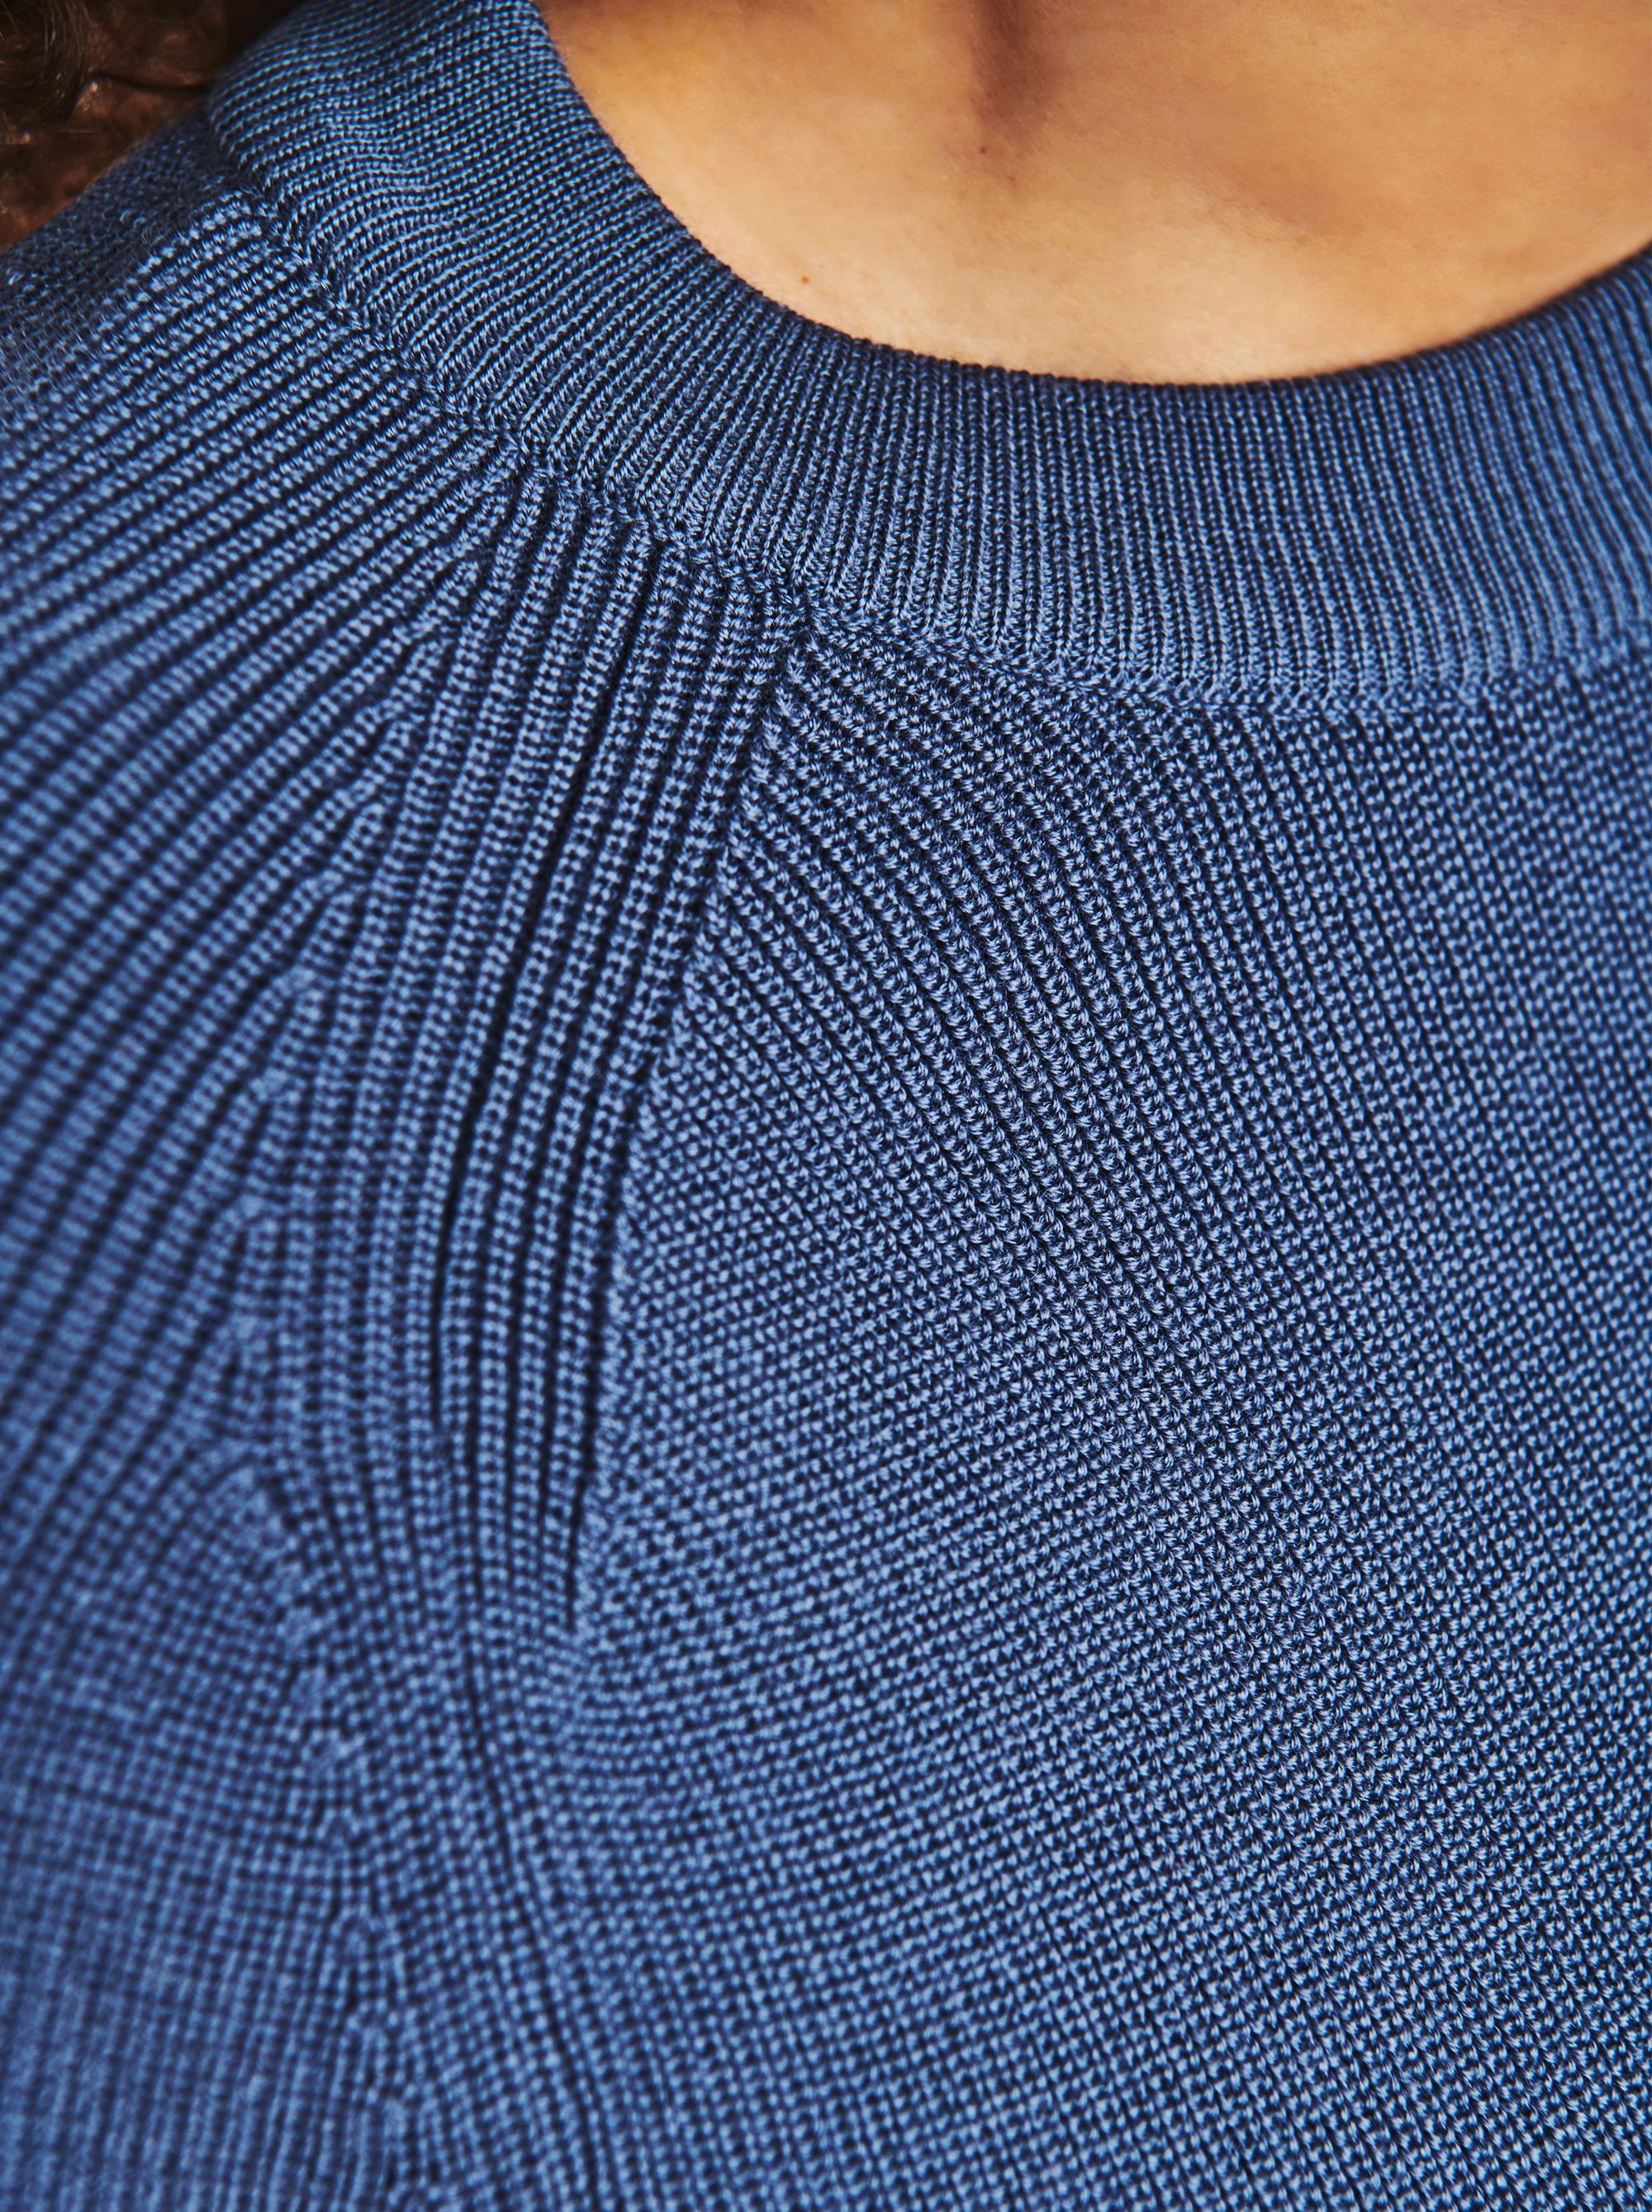 Teym - Crewneck - The Merino Sweater - Women - Sky blue - 3